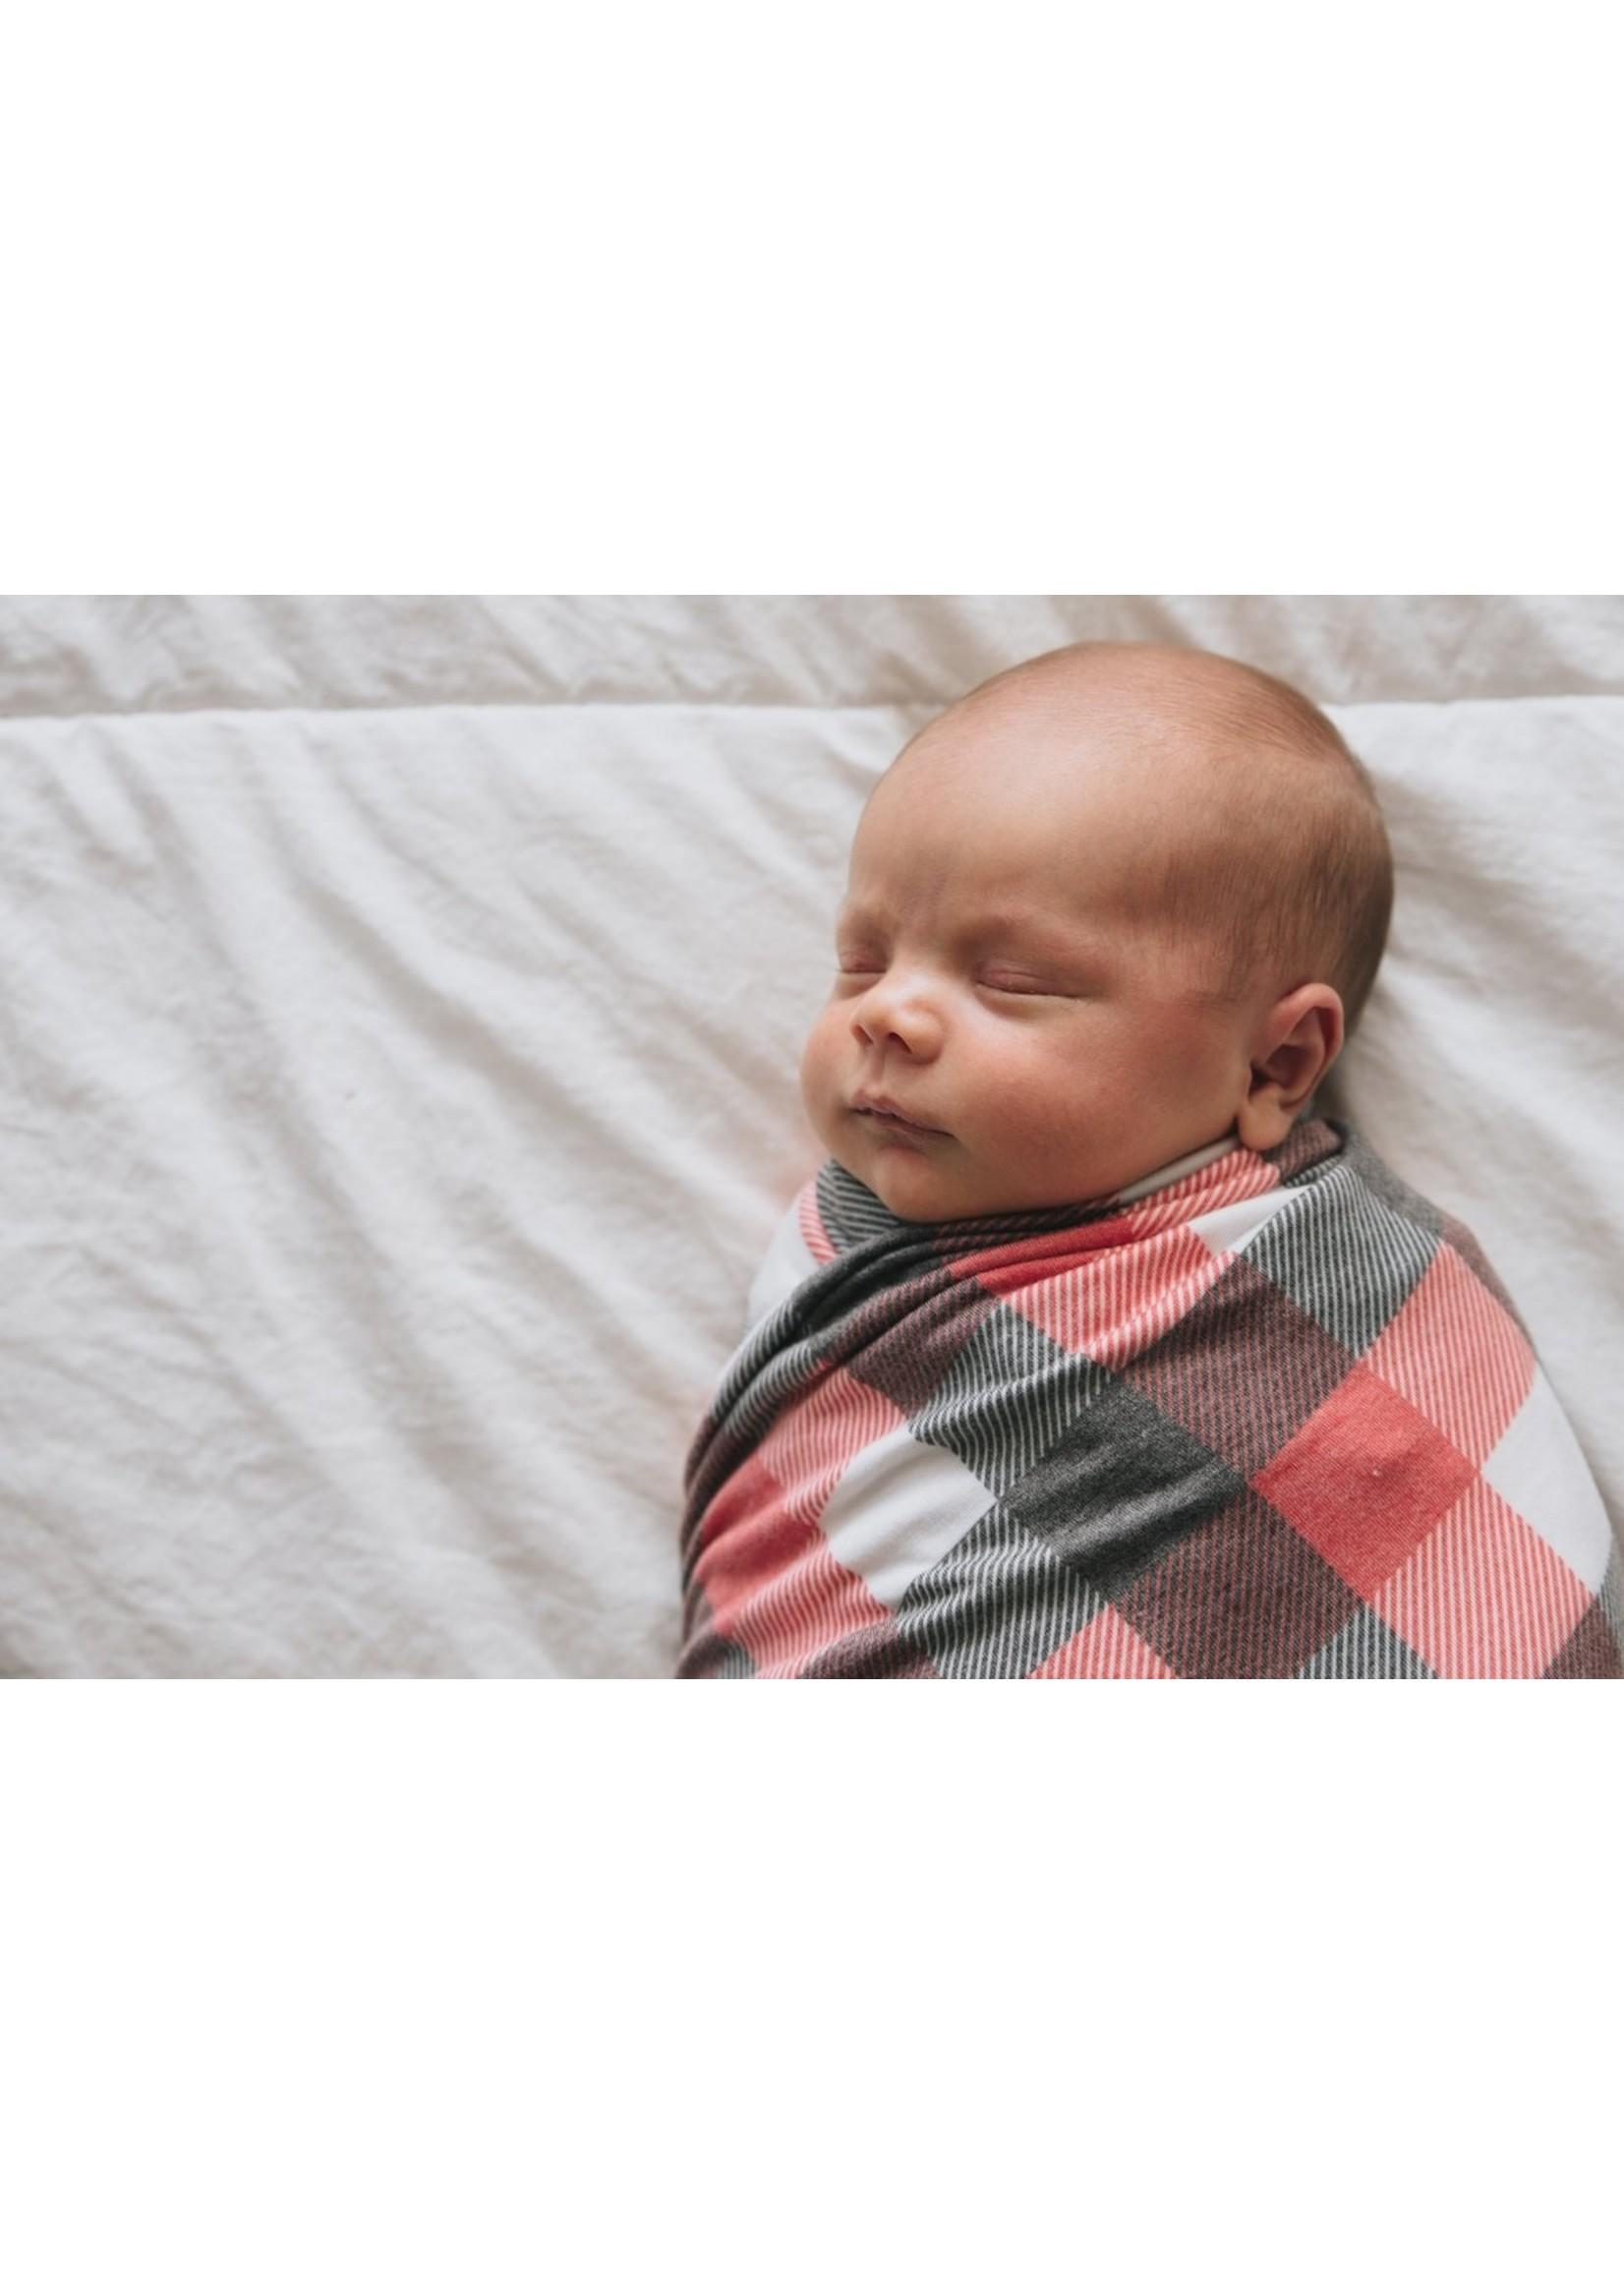 Copper pearl Swaddle Blanket - Jack